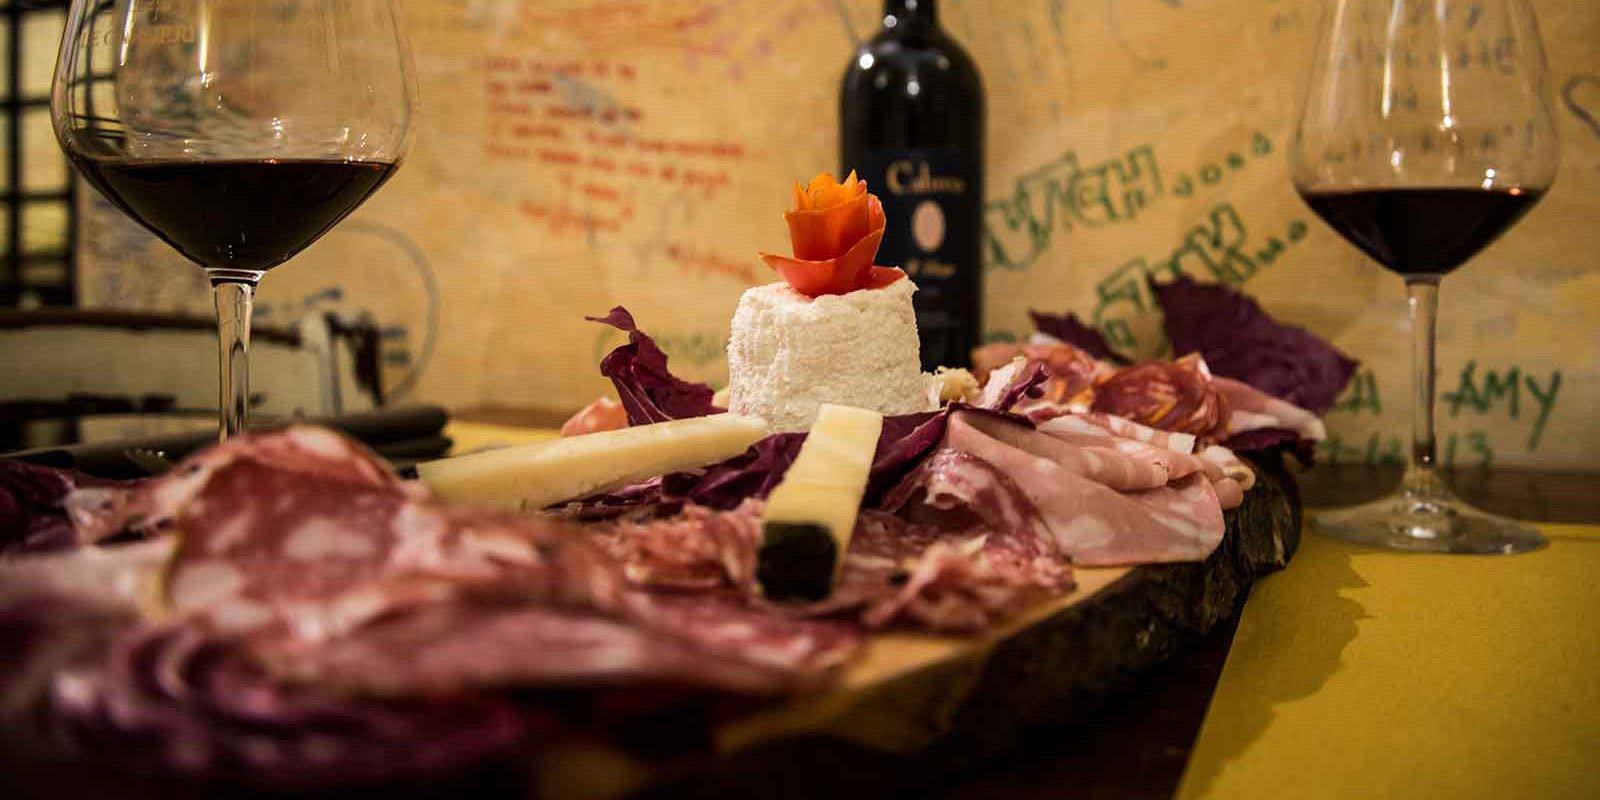 Ristorante le carceri a firenze cucina toscana cucina mediterranea partners orizzonte - Ristorante cucina toscana firenze ...